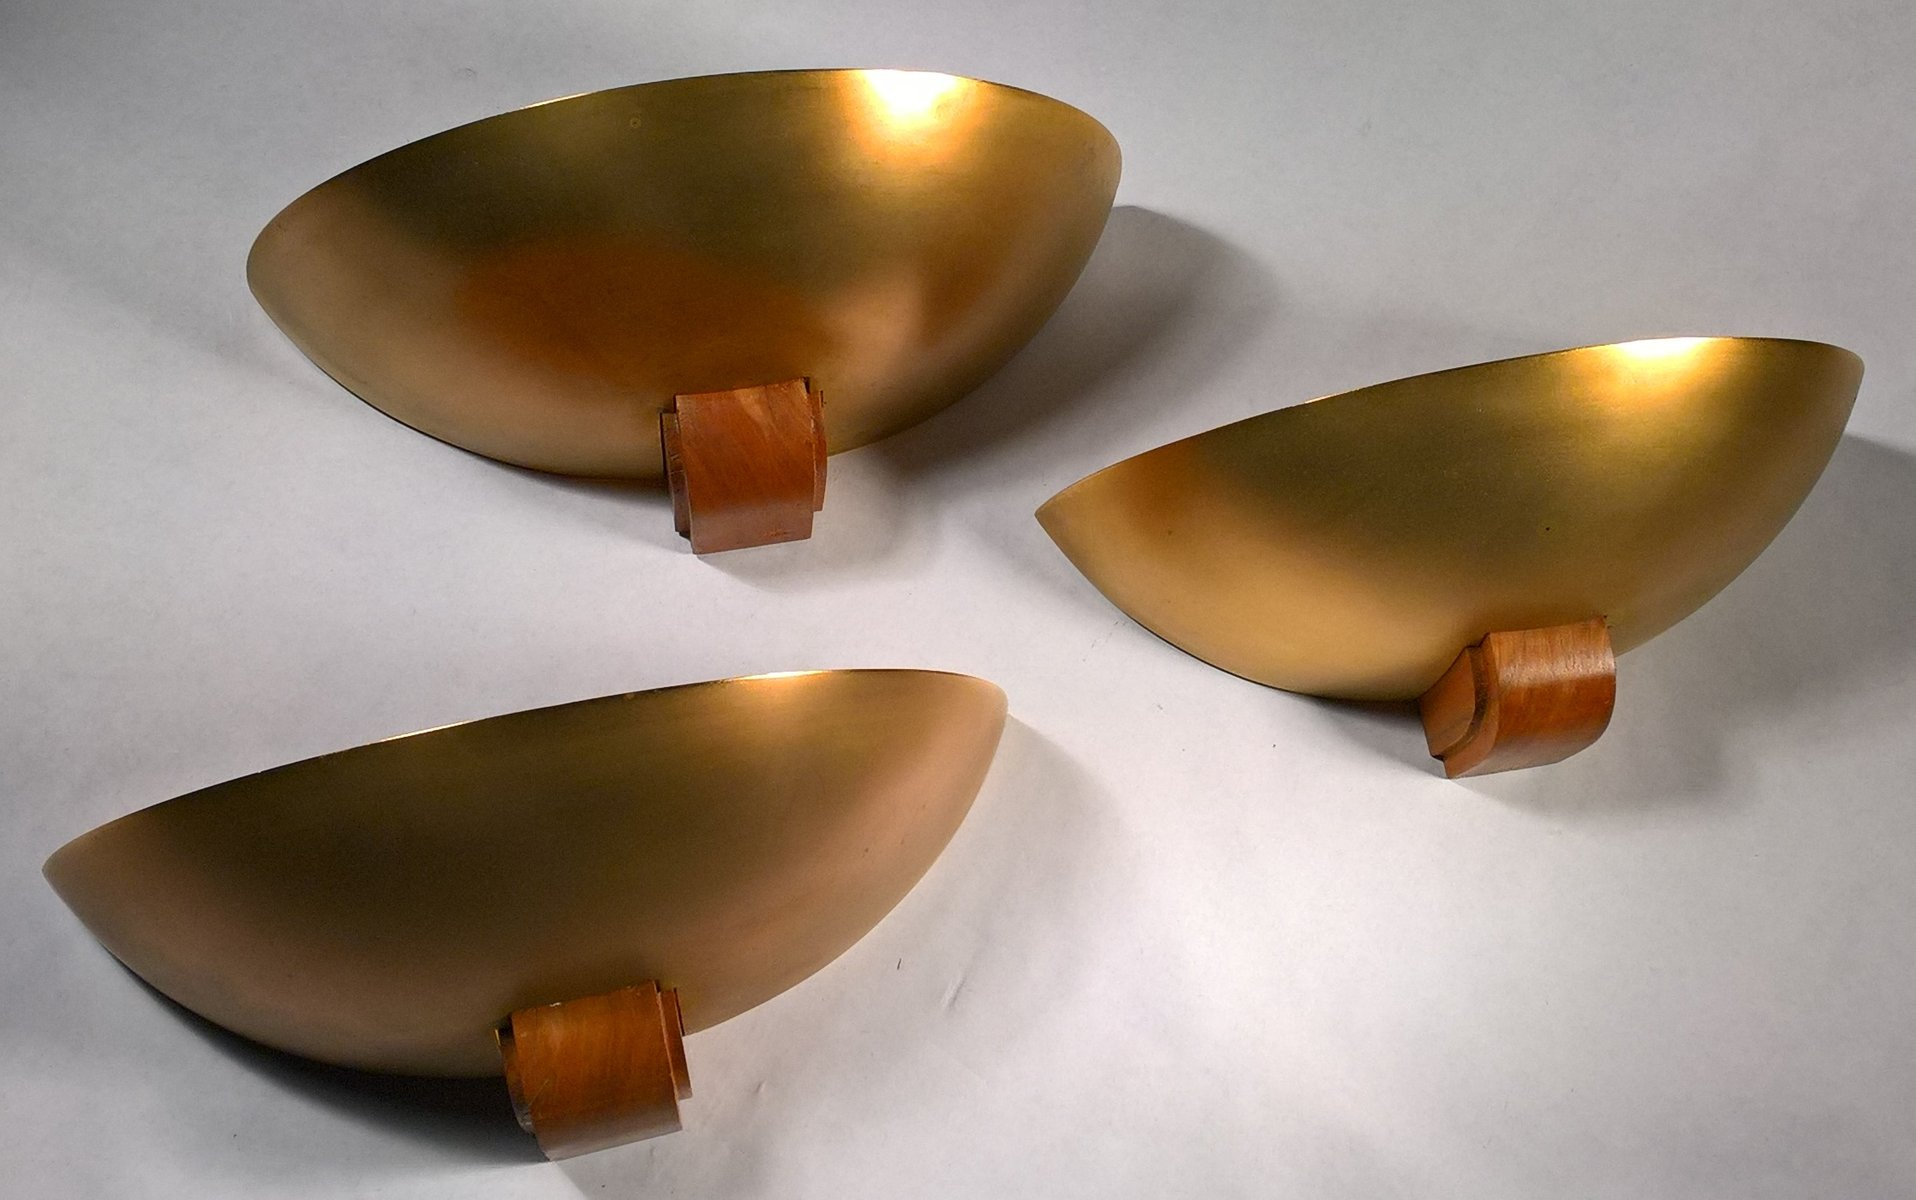 Vergoldete Art Deco Messing & Holz Wandlampen, 1930er, 3er Set